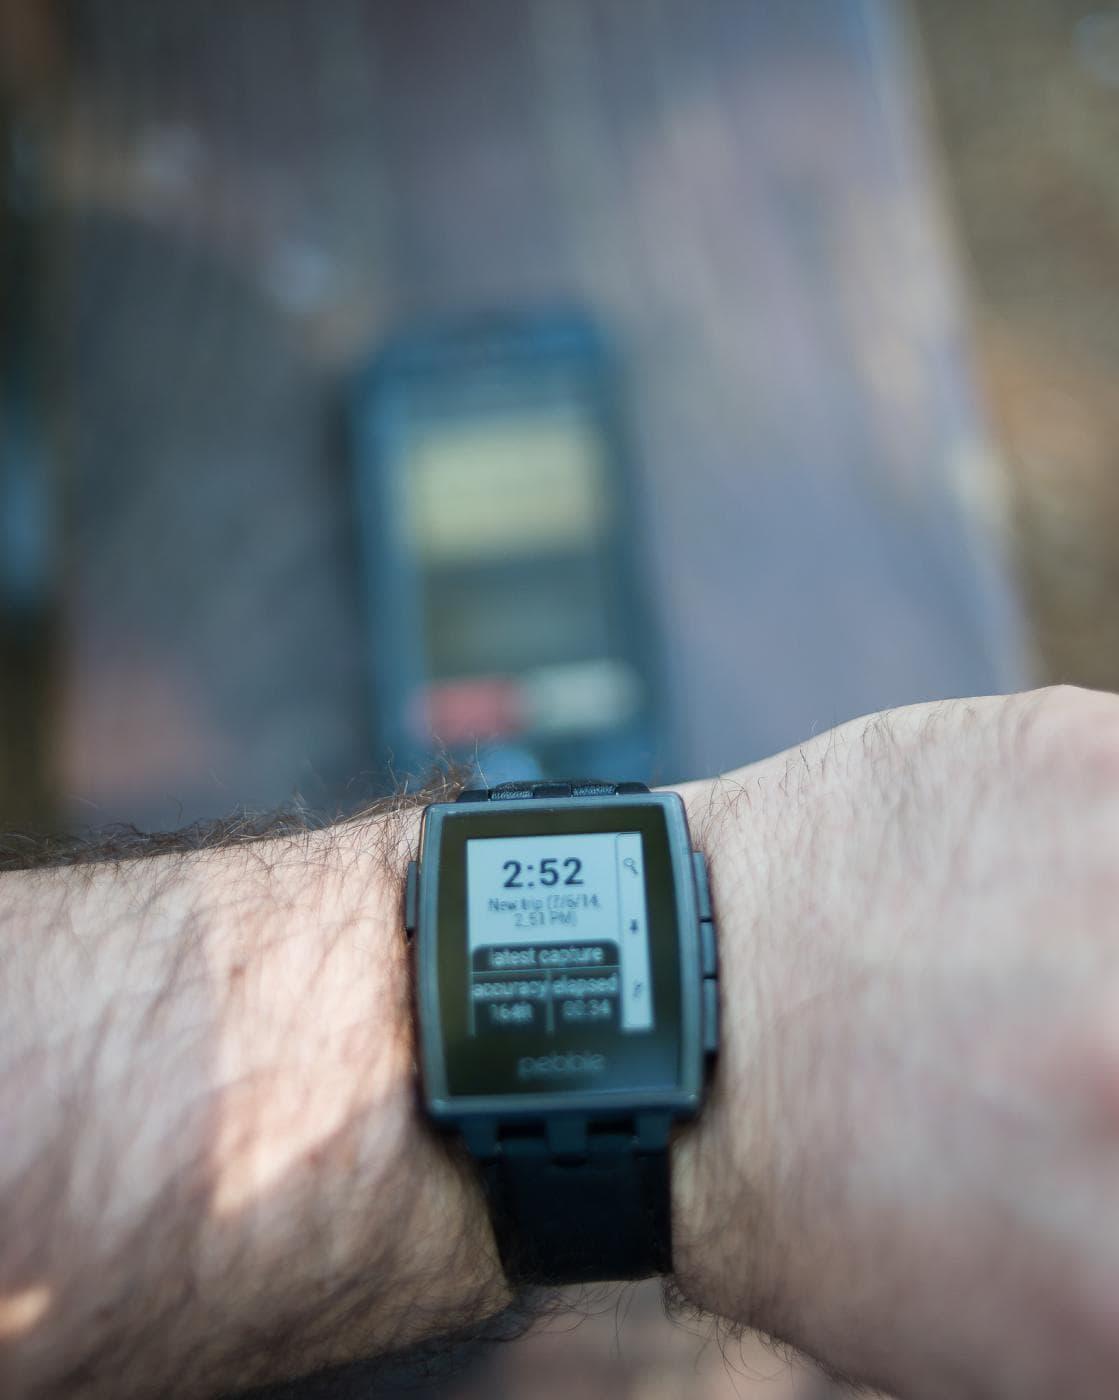 GPS4cam & Pebble Smartwatch Sitting On A Wrist